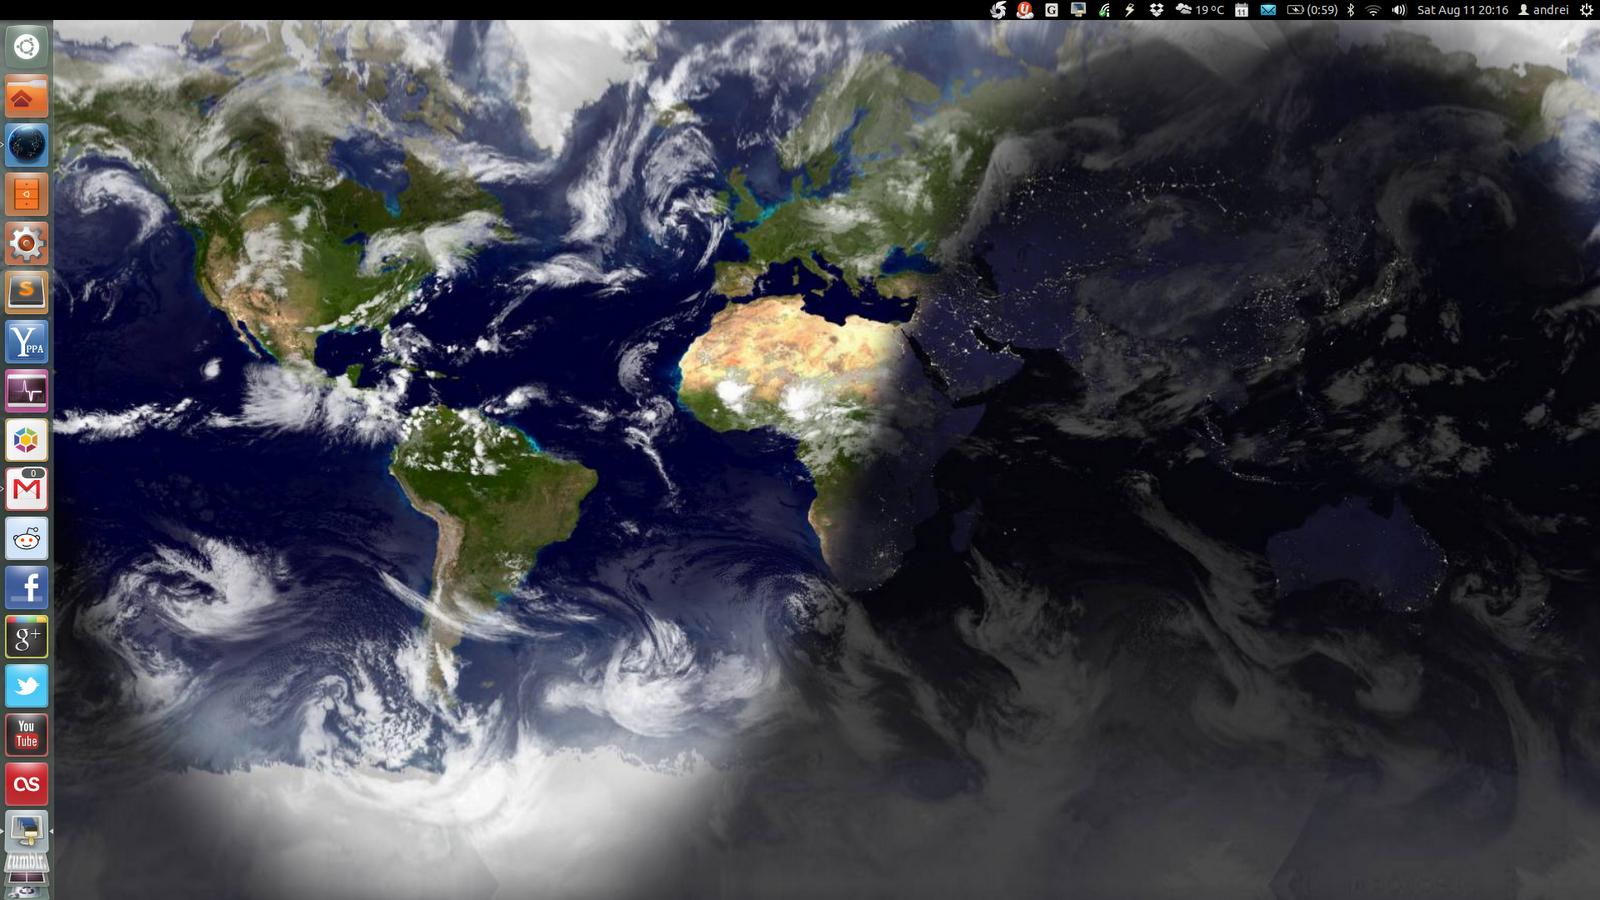 World map screensaver wallpaper wallpapersafari use wallpaper clocks live earth wallpaper in ubuntu with slidewall 1600x900 gumiabroncs Images